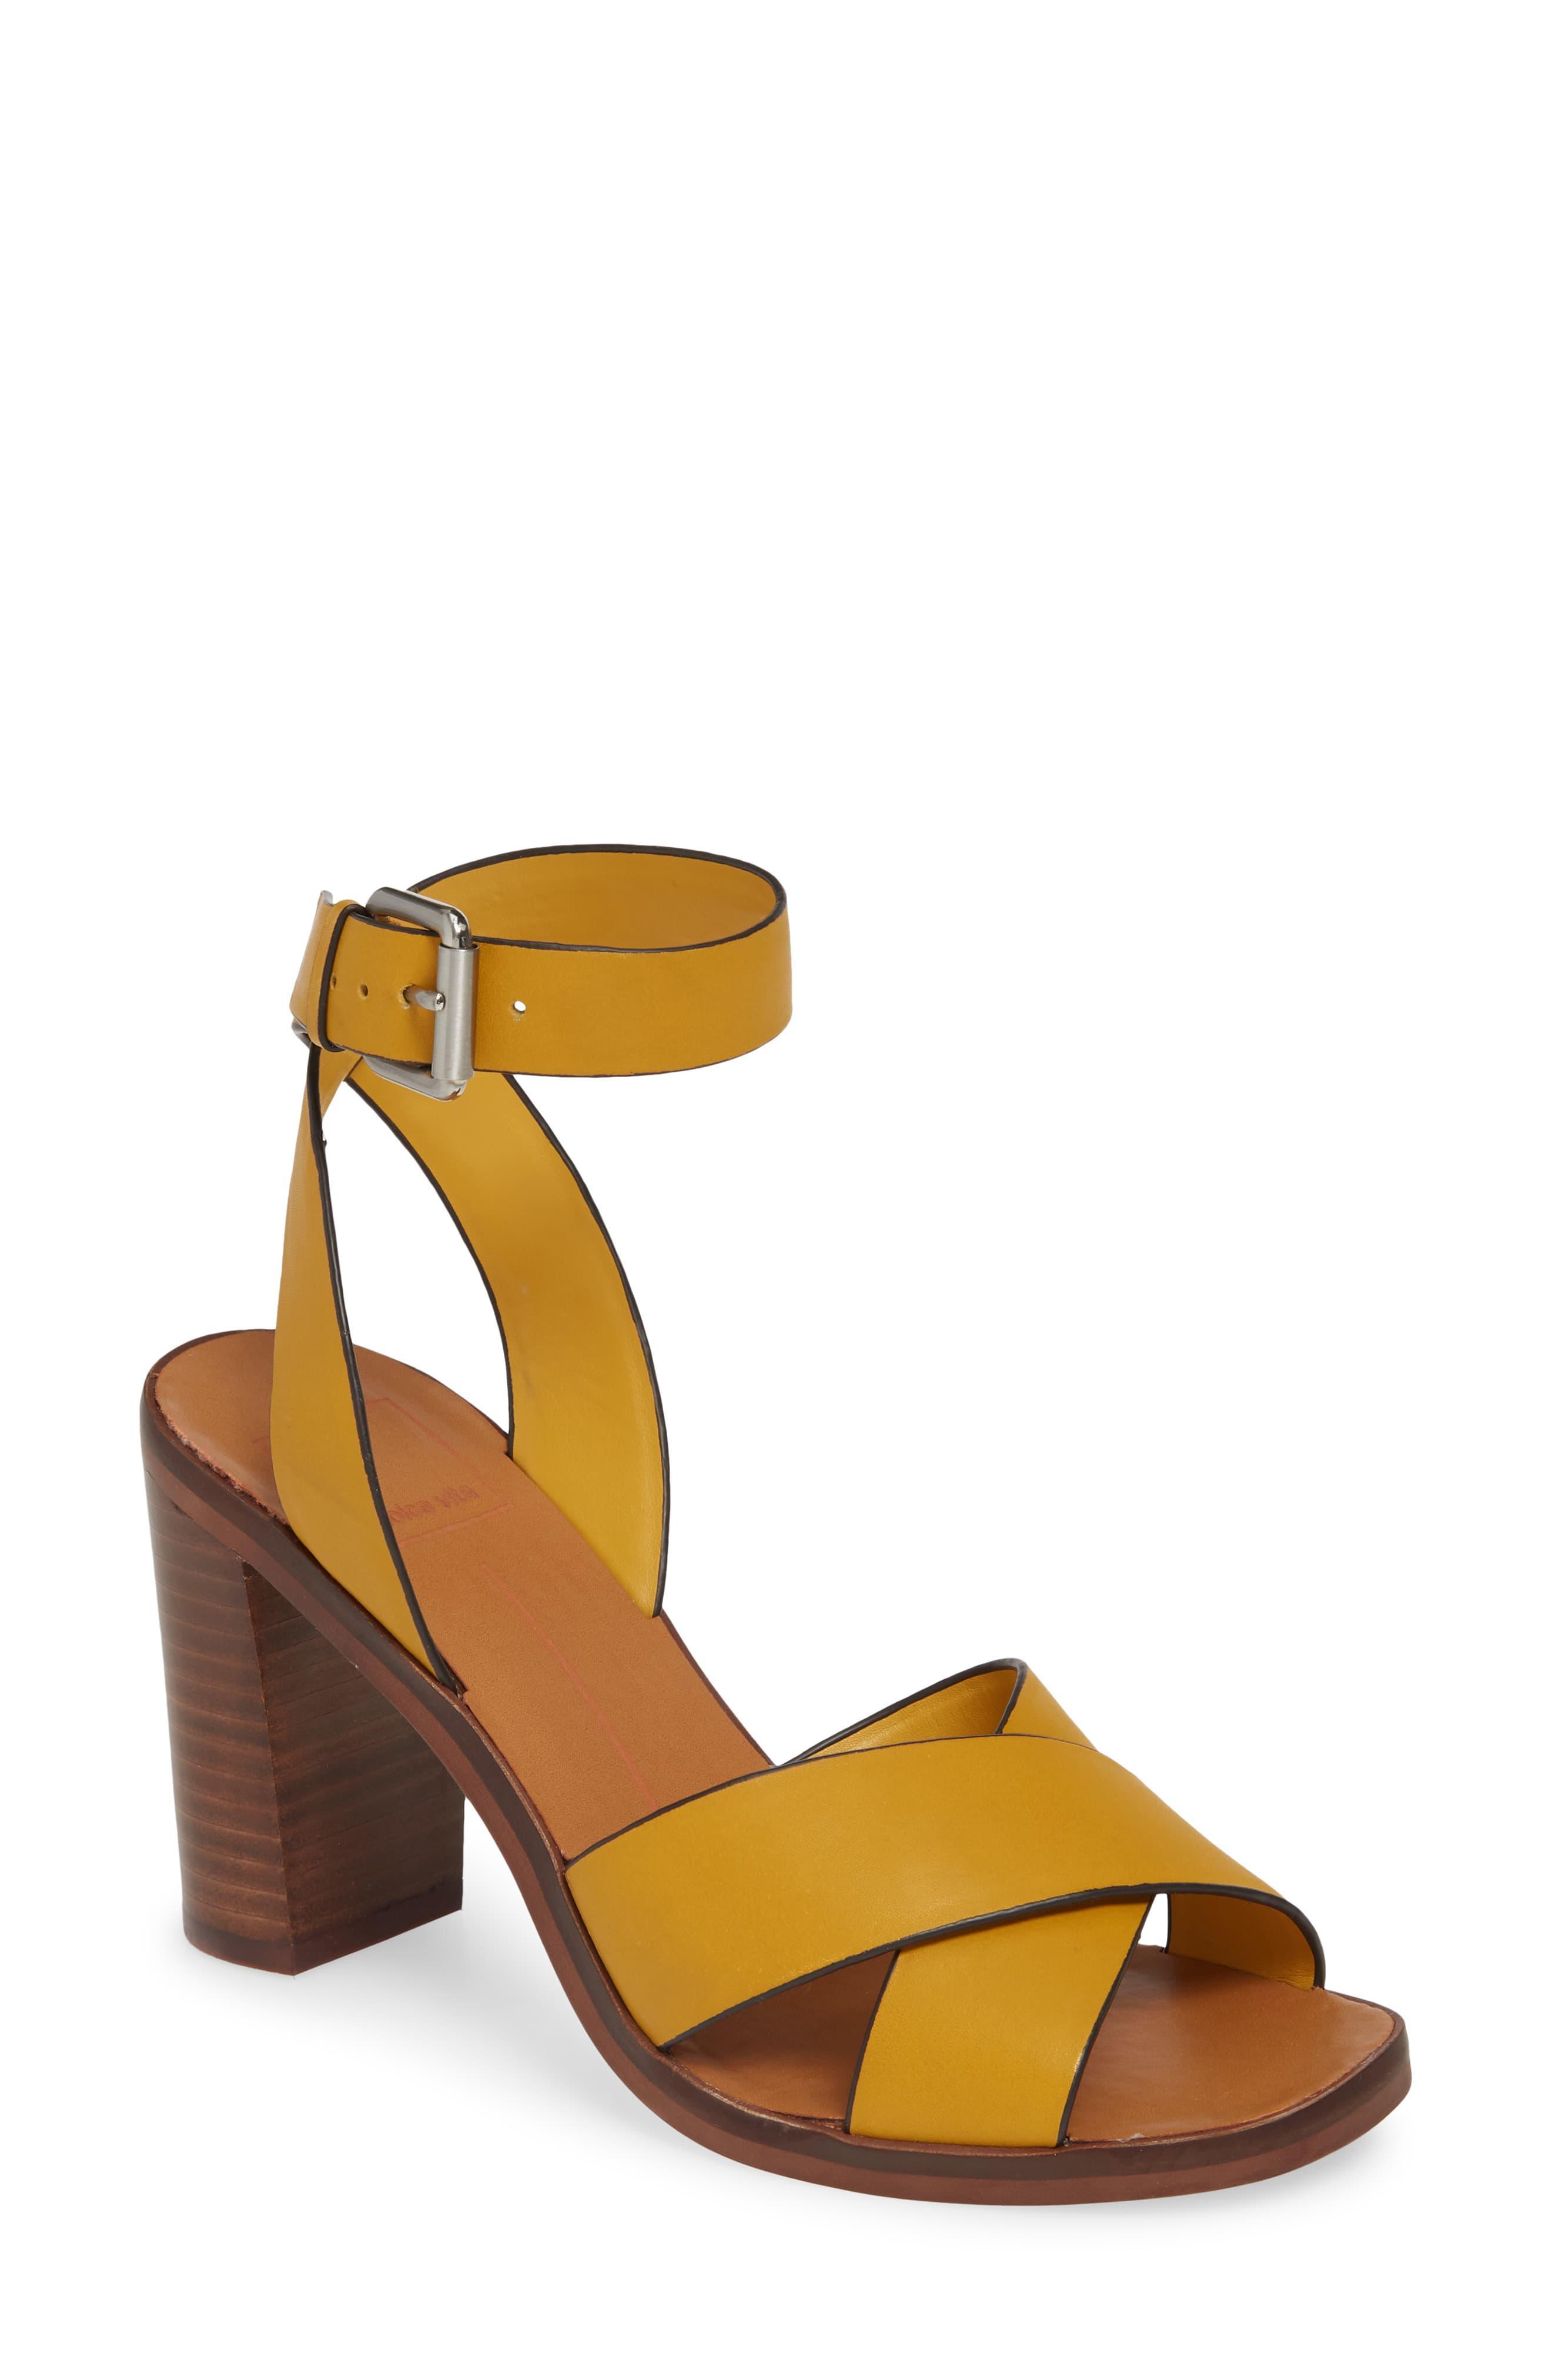 7512430c45 Dolce Vita Nala Sandal in Metallic - Save 40% - Lyst